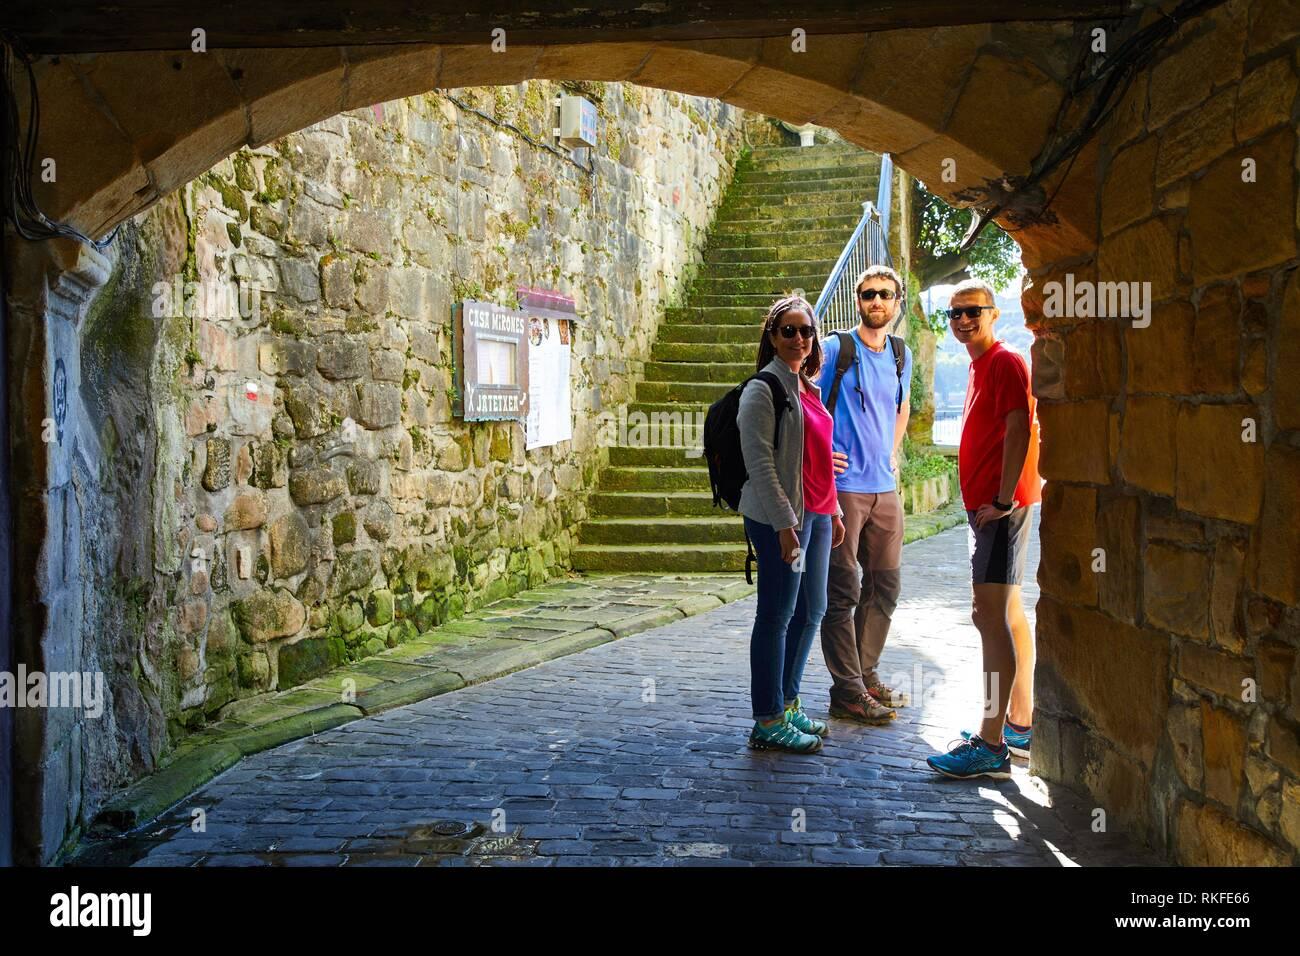 Guide and group of tourists visiting the city, Pasai Donibane, Pasajes de San Juan, Gipuzkoa, Basque Country, Spain, Europe - Stock Image